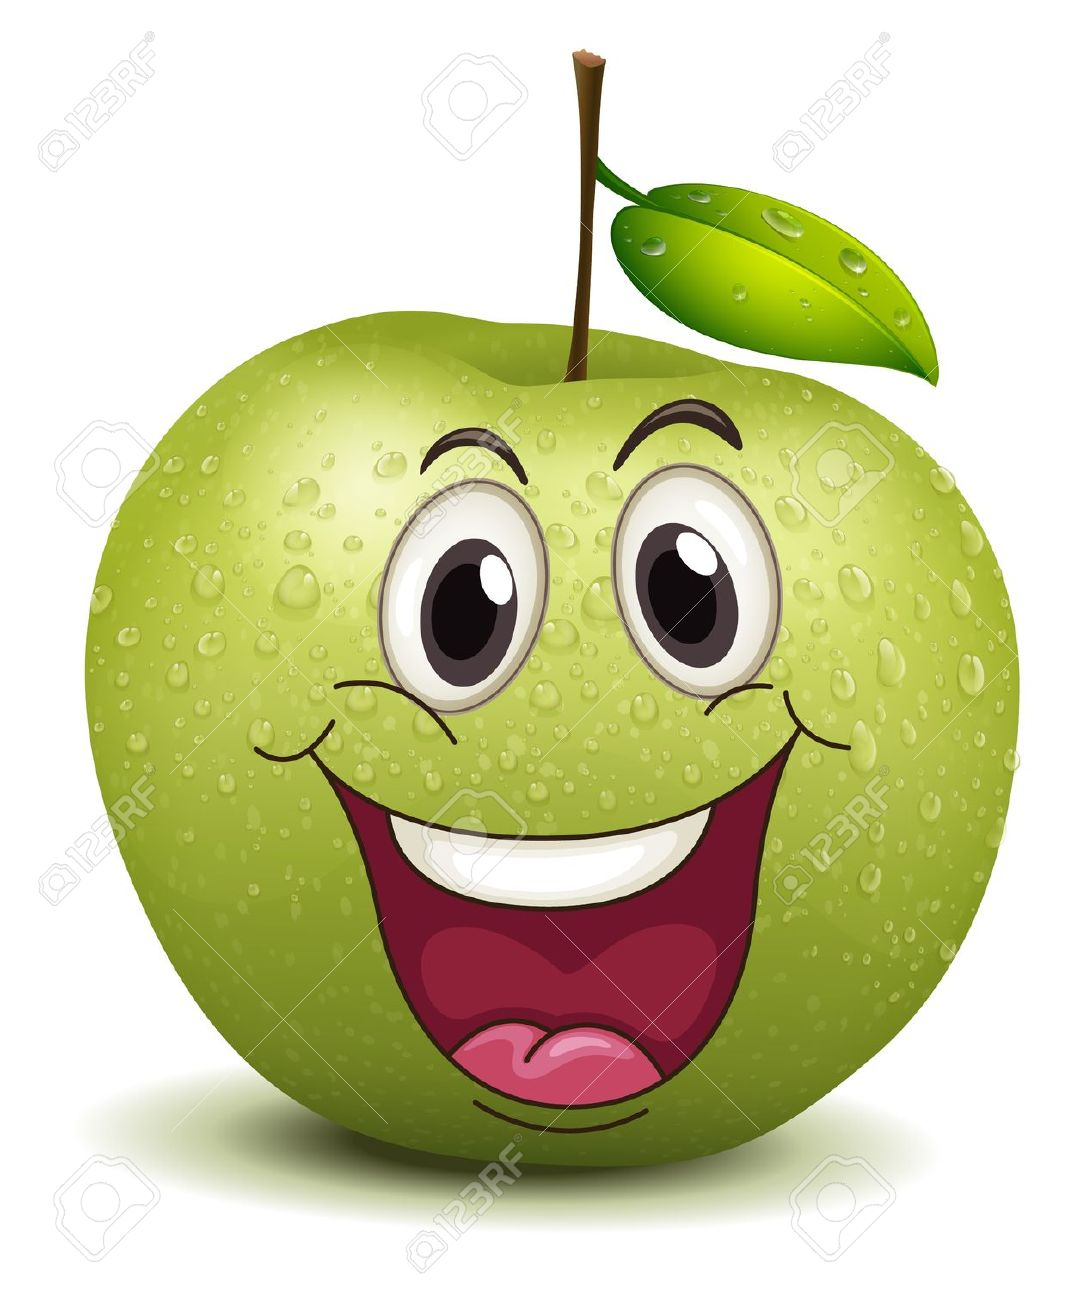 Apple Smileys